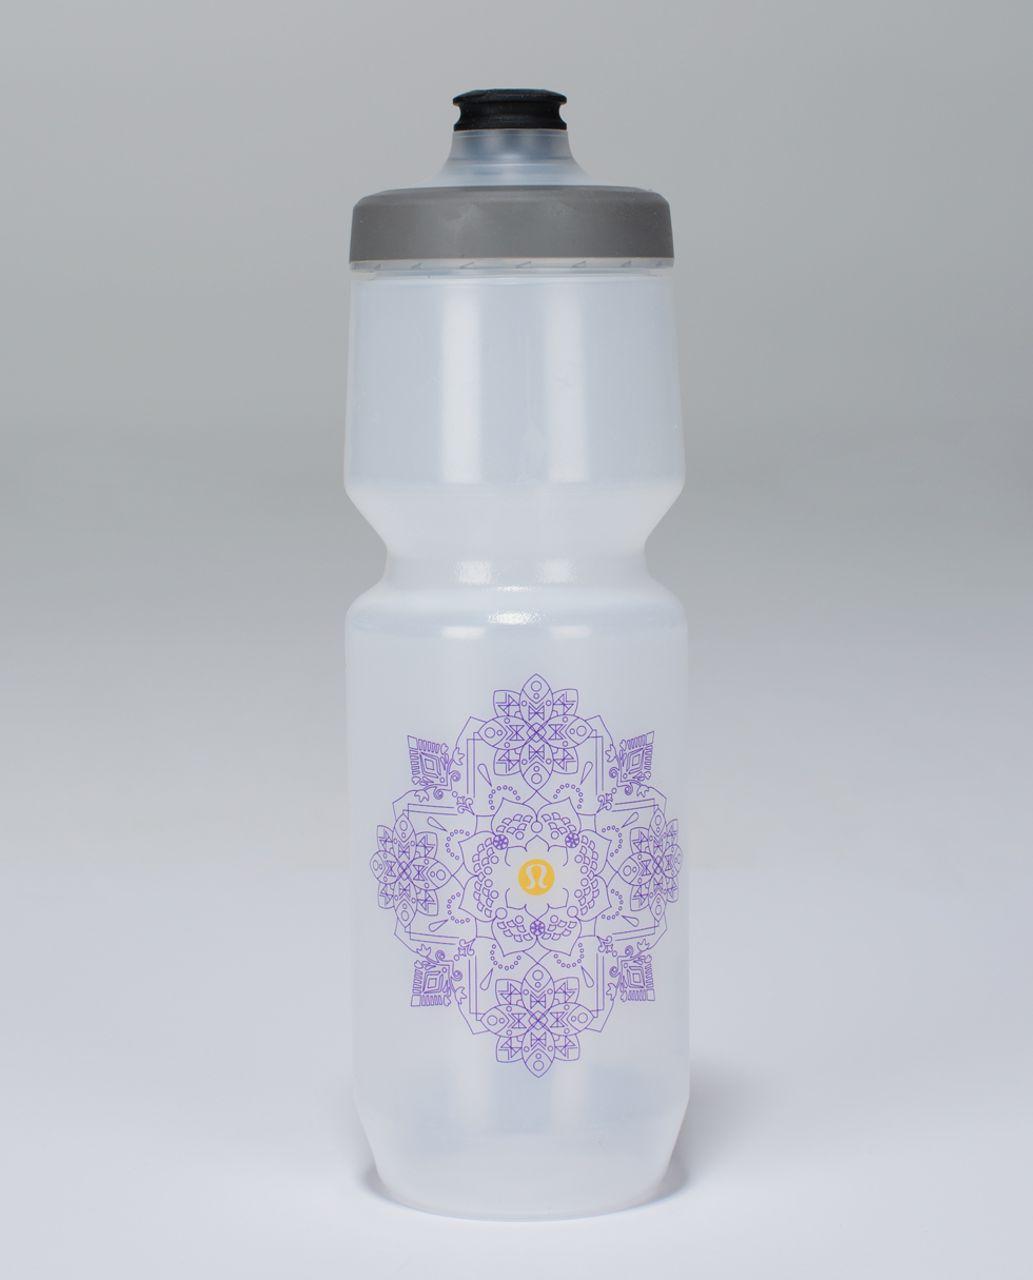 Lululemon Purist Cycling Water Bottle II - Get Rooted Bananarama